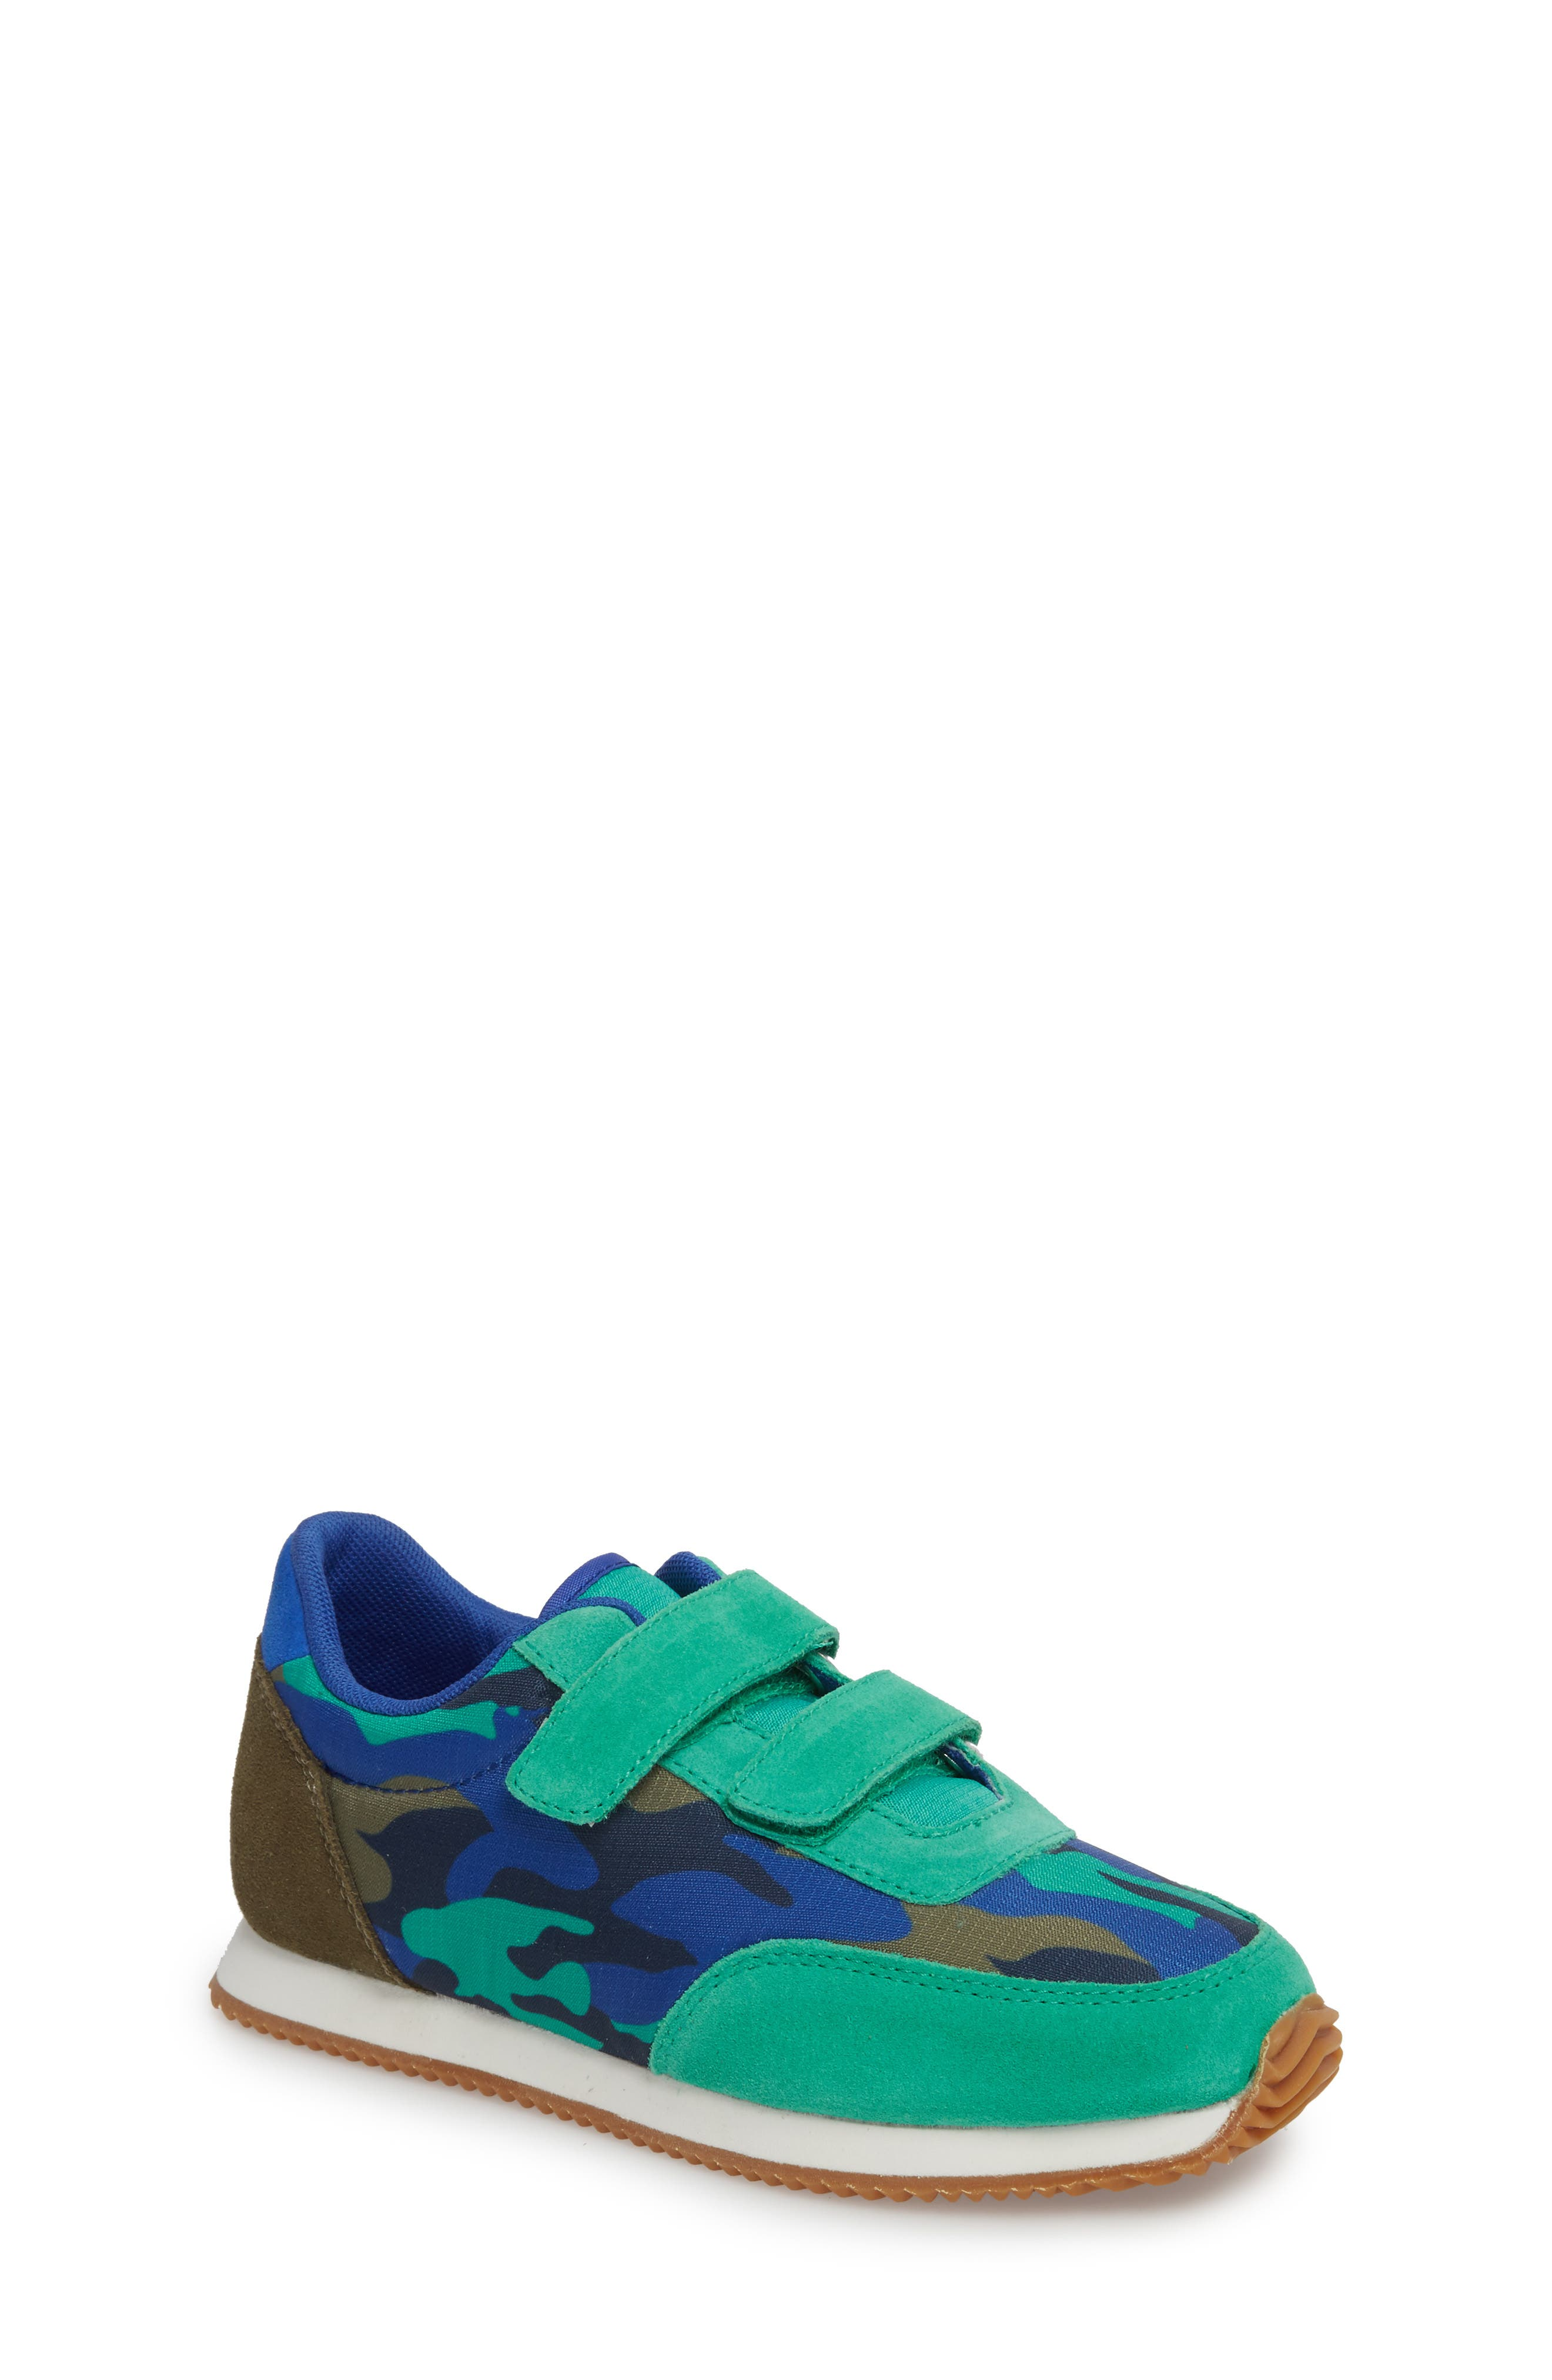 Print Sneakers,                             Main thumbnail 1, color,                             Astro Green